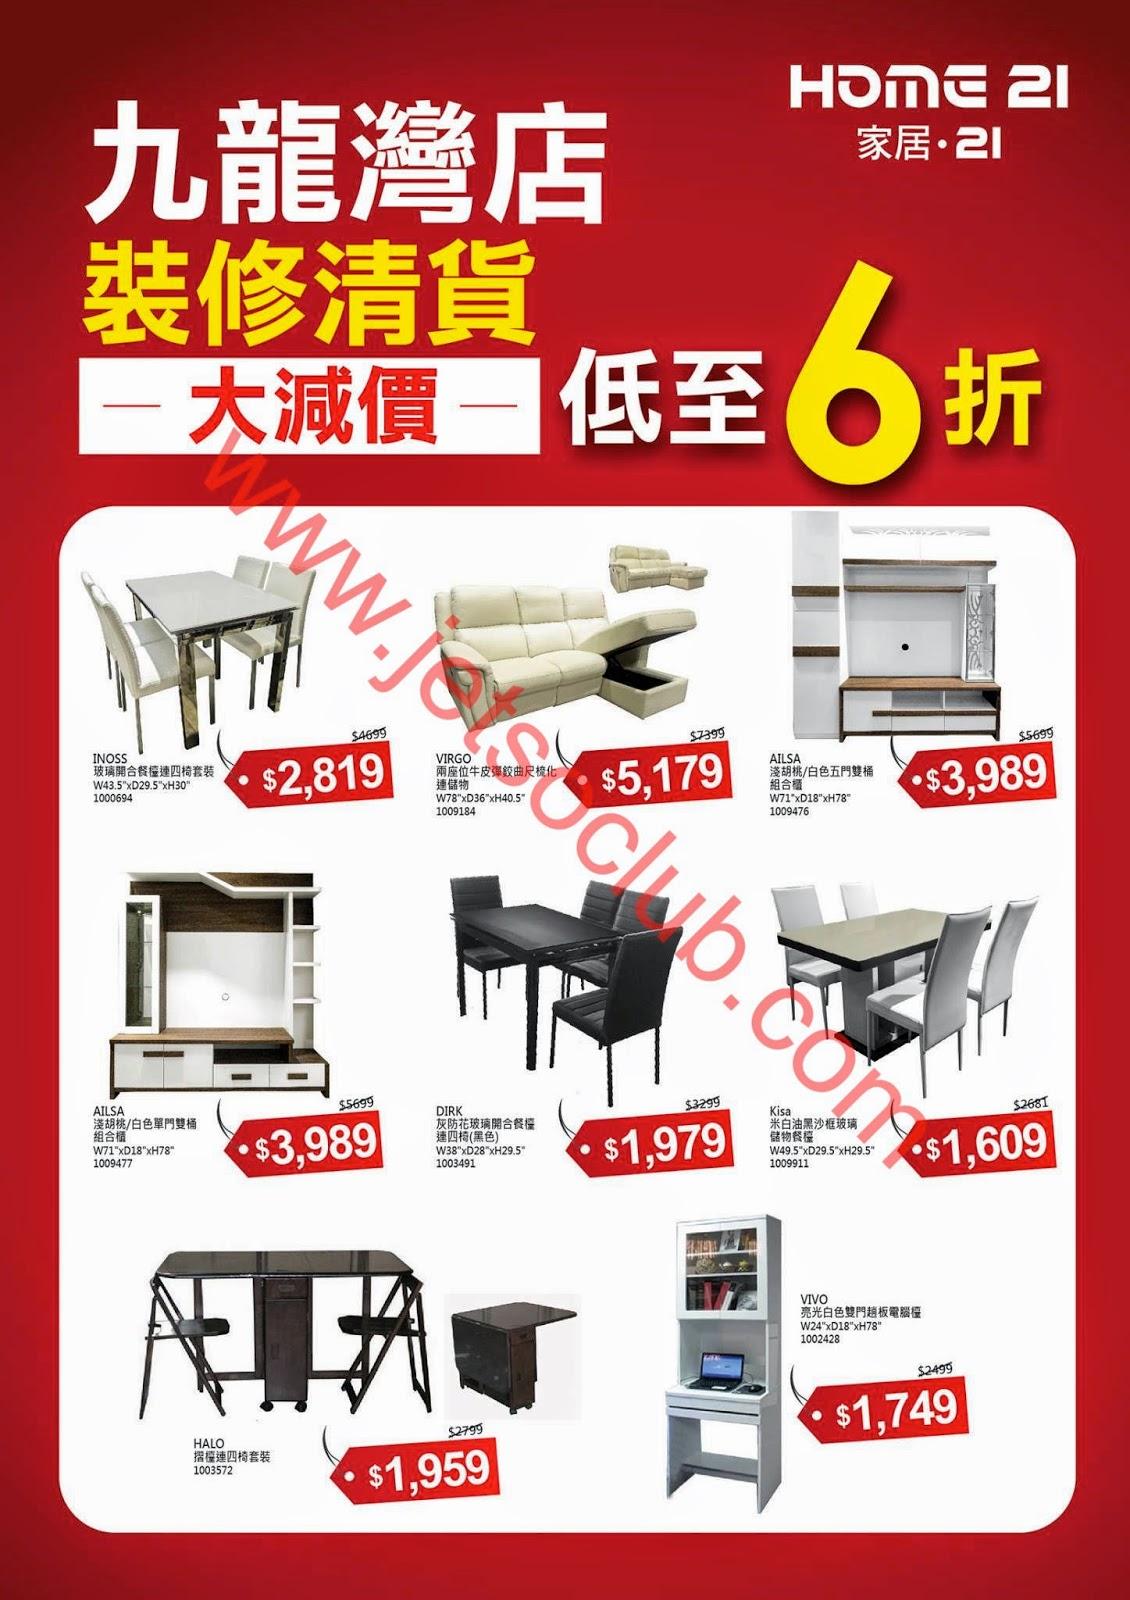 Home 21:九龍灣MegaBox店 裝修清貨大優惠 低至6折(至10/5) ( Jetso Club 著數俱樂部 )